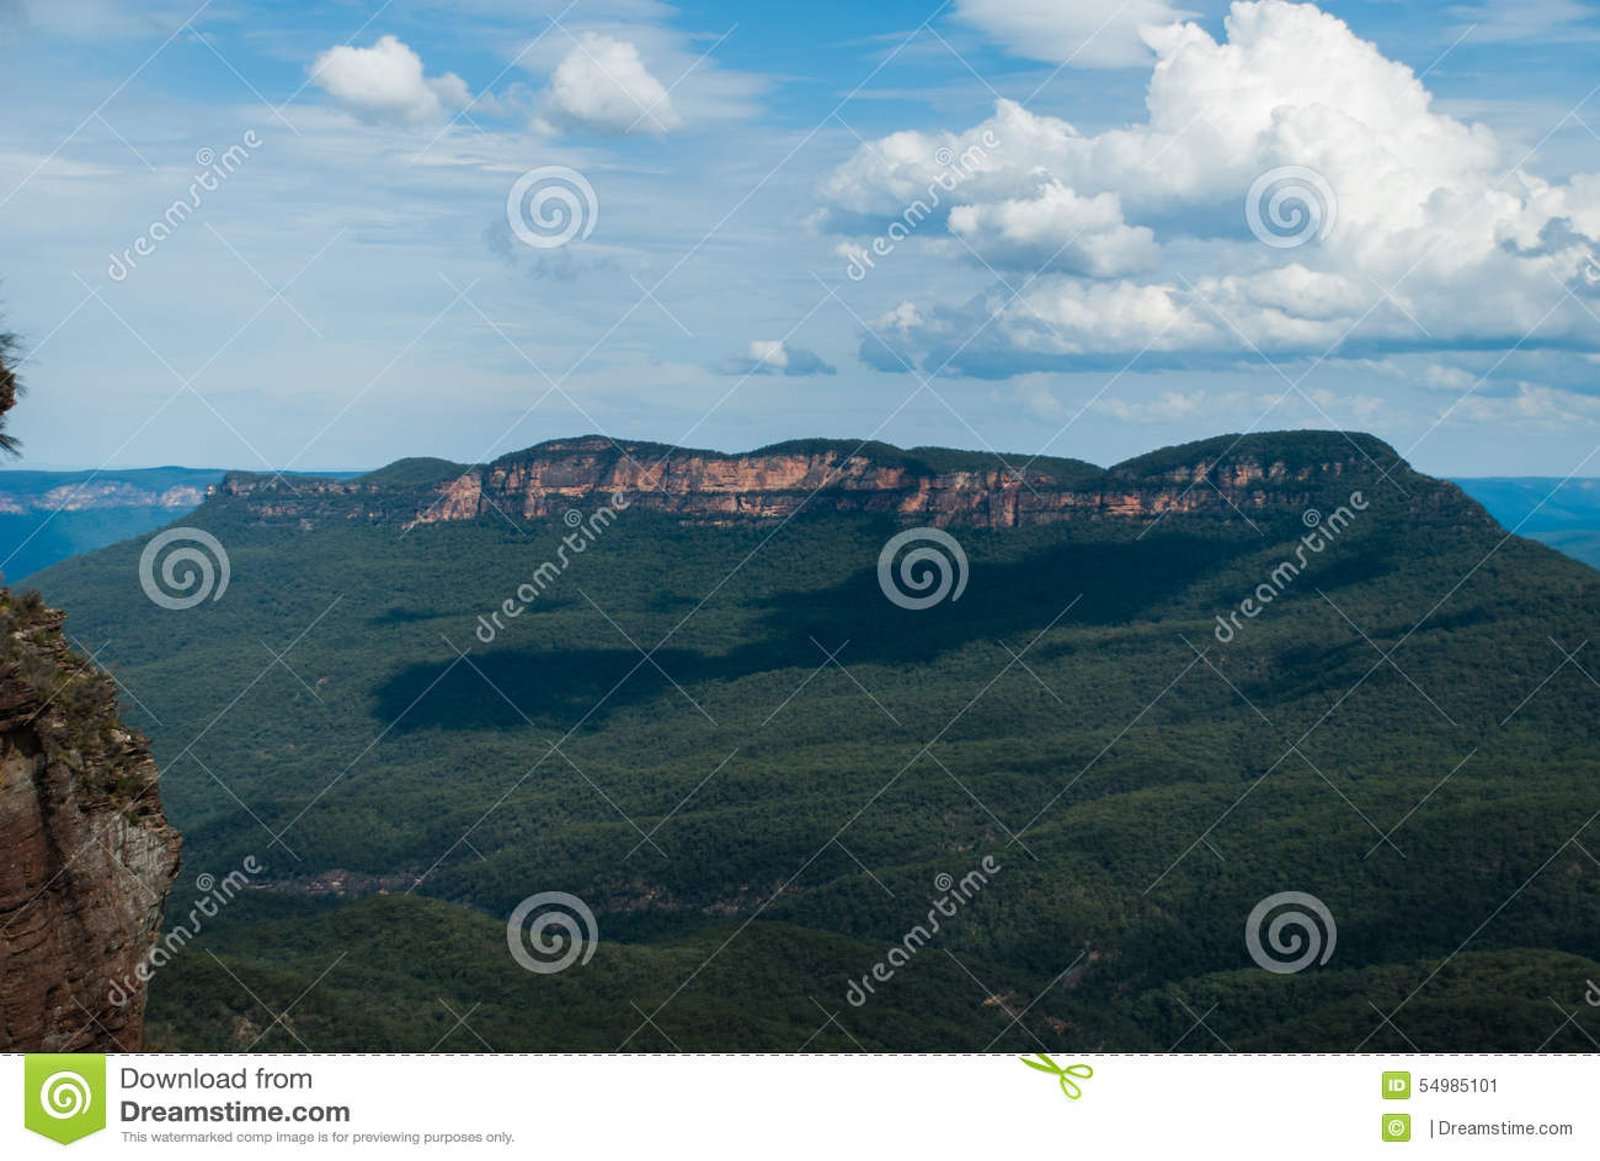 Ensamt berg